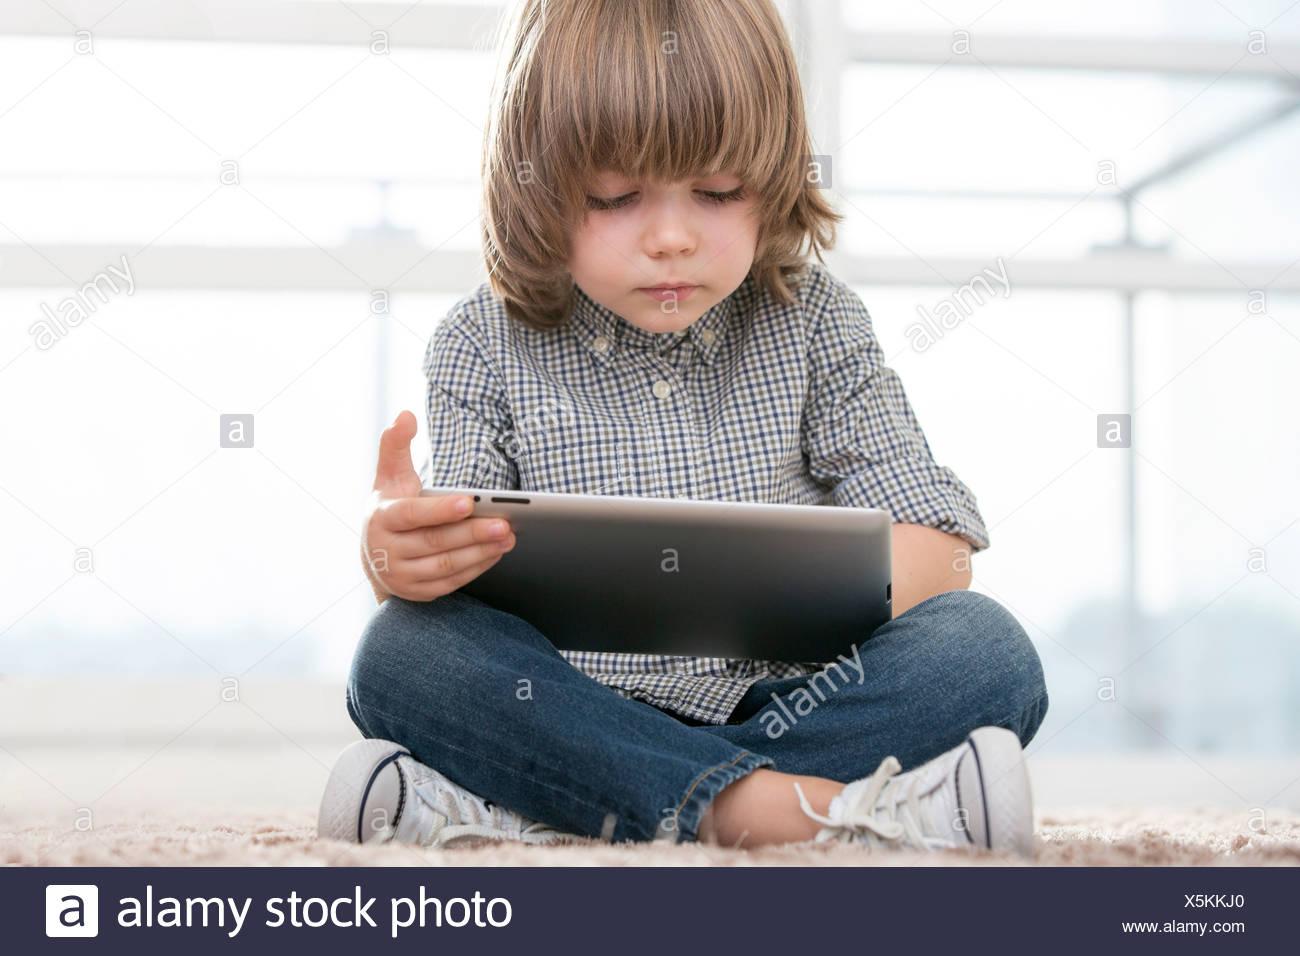 Toute la longueur de boy using digital tablet in living room Photo Stock